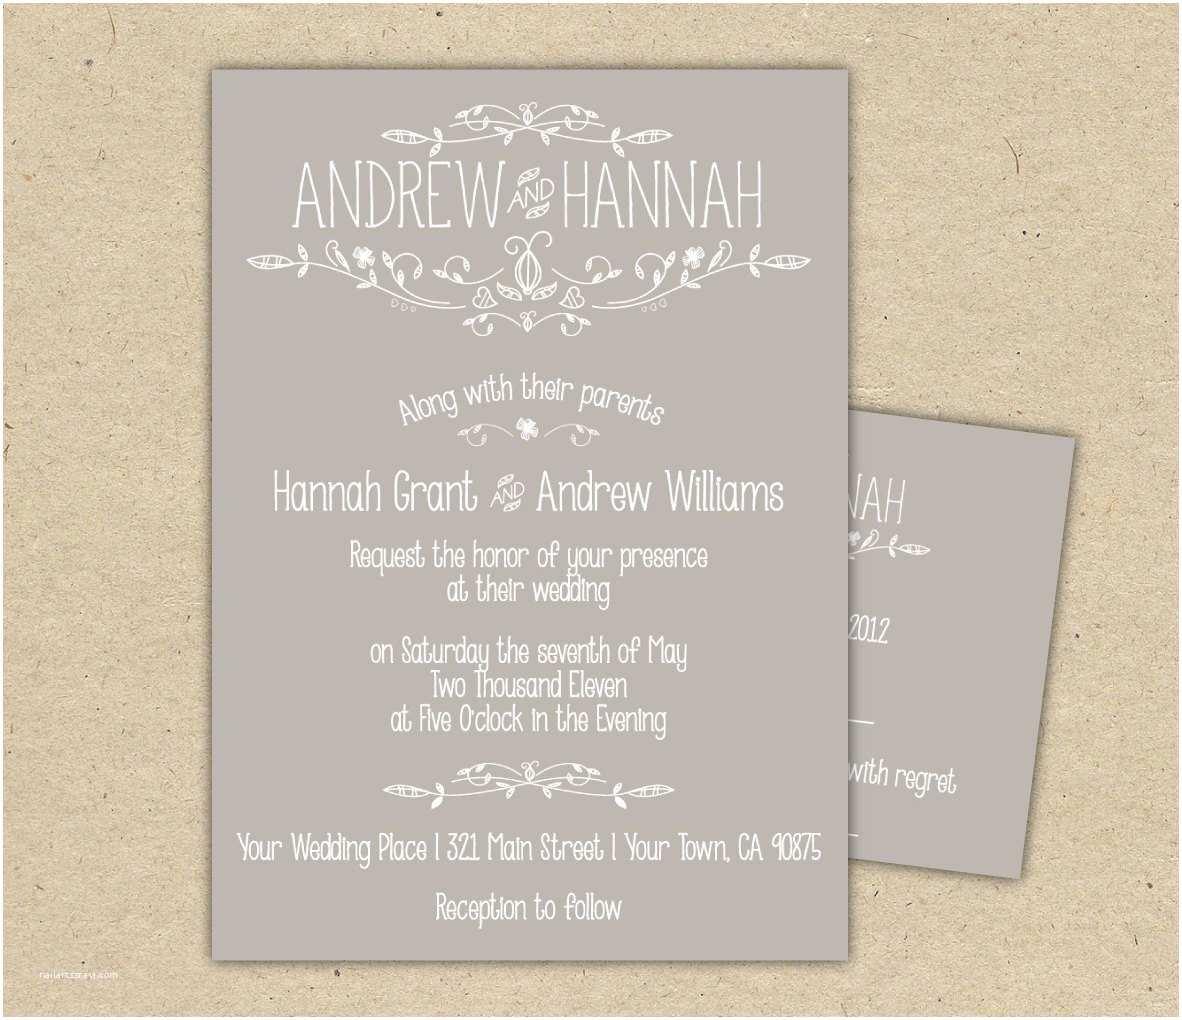 Wedding Invitation Rsvp Wording Samples Wedding Invitation Wording Wedding Invitation Wording